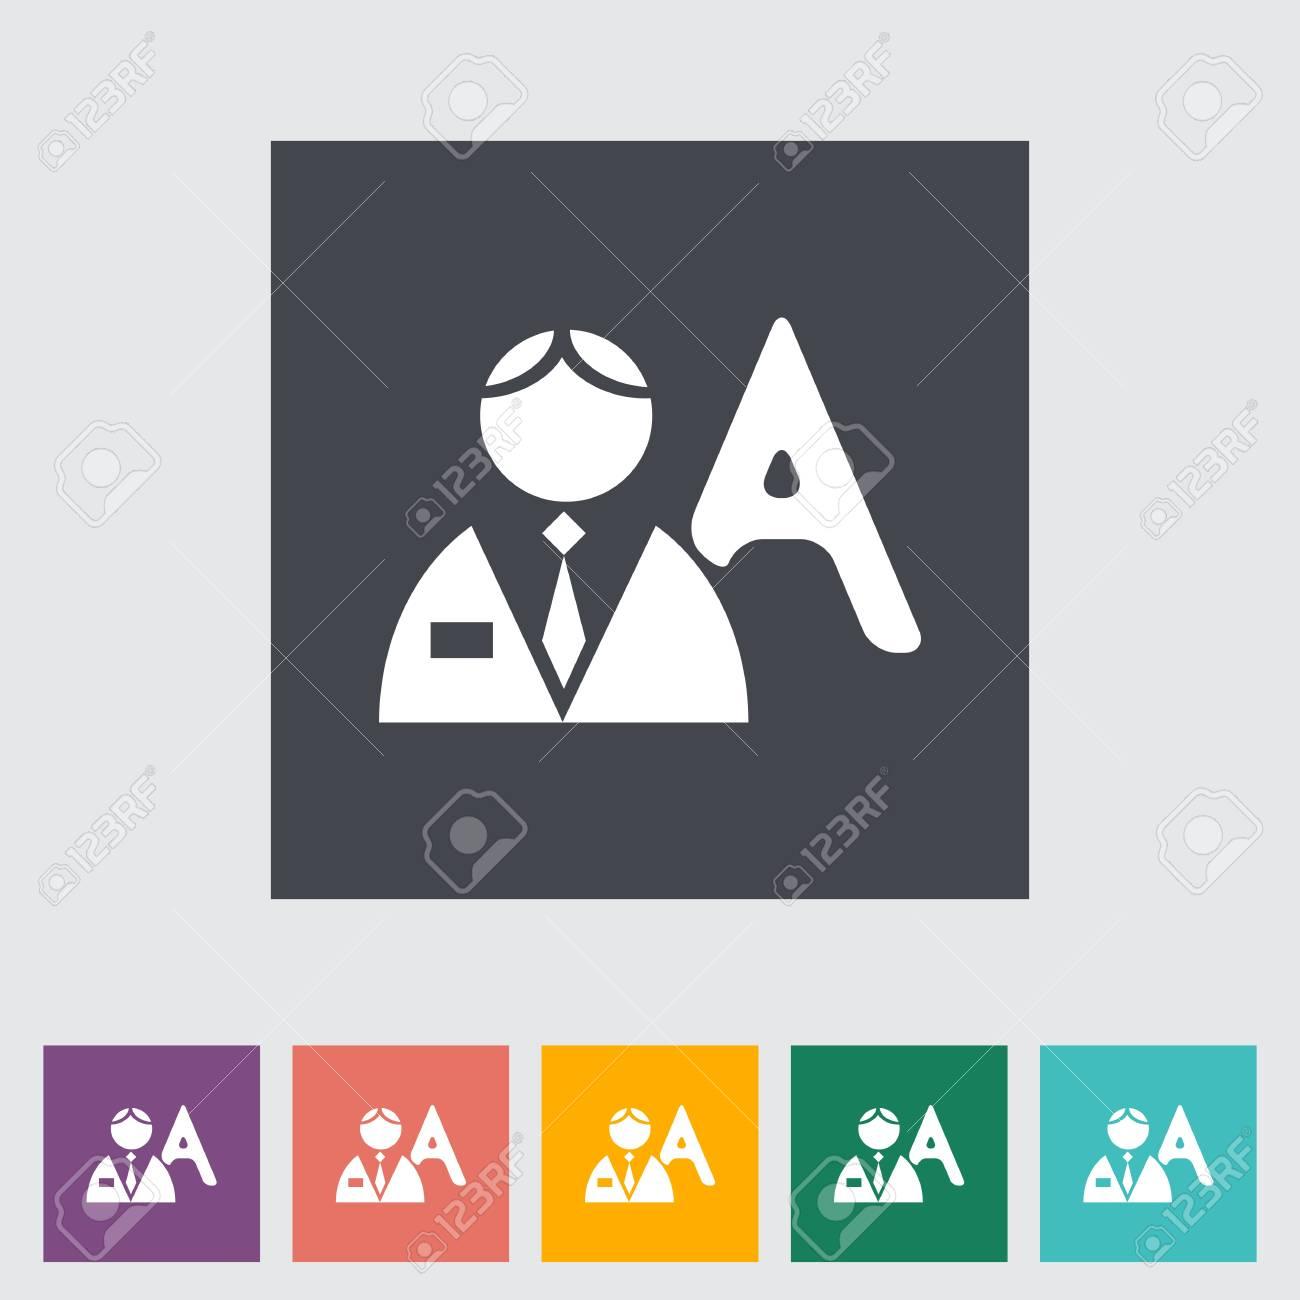 Person single flat icon. Vector illustration. Stock Vector - 21319468